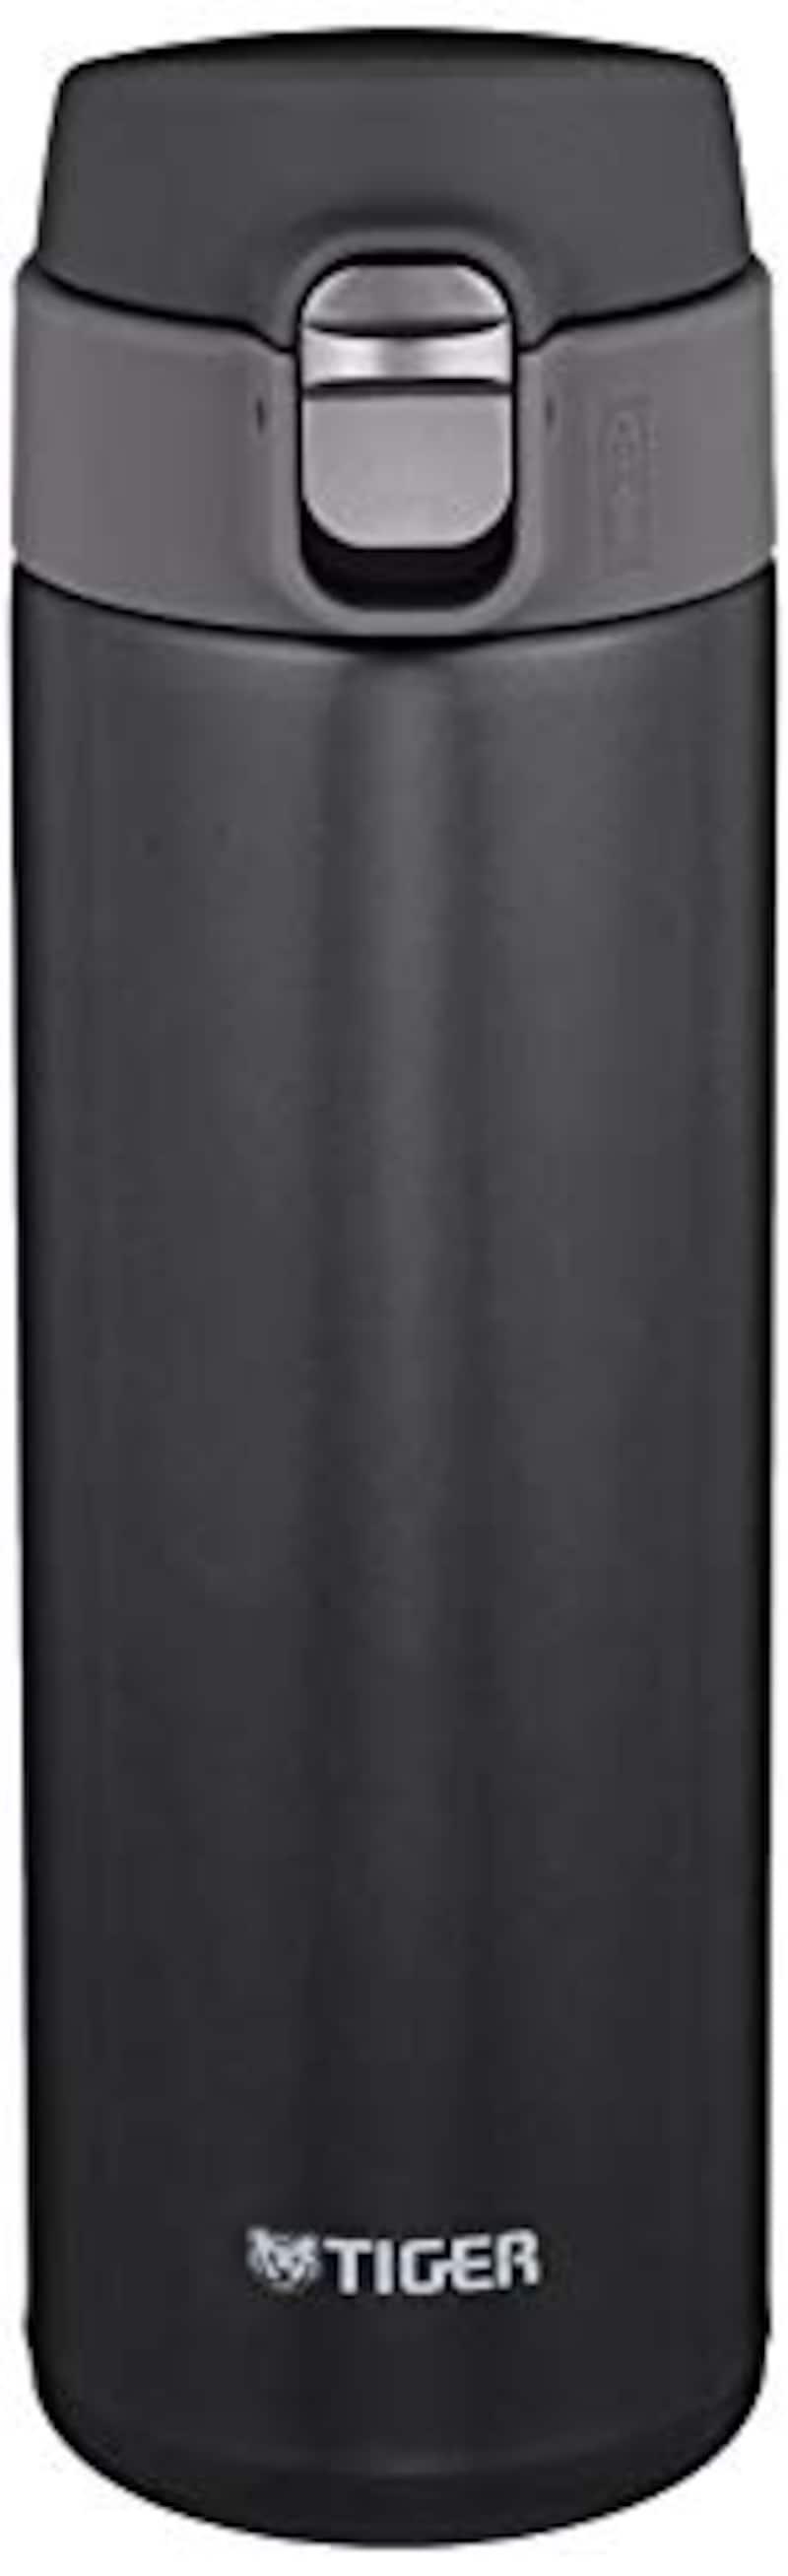 TIGER(タイガー魔法瓶),真空断熱ボトル,MMJ-A482